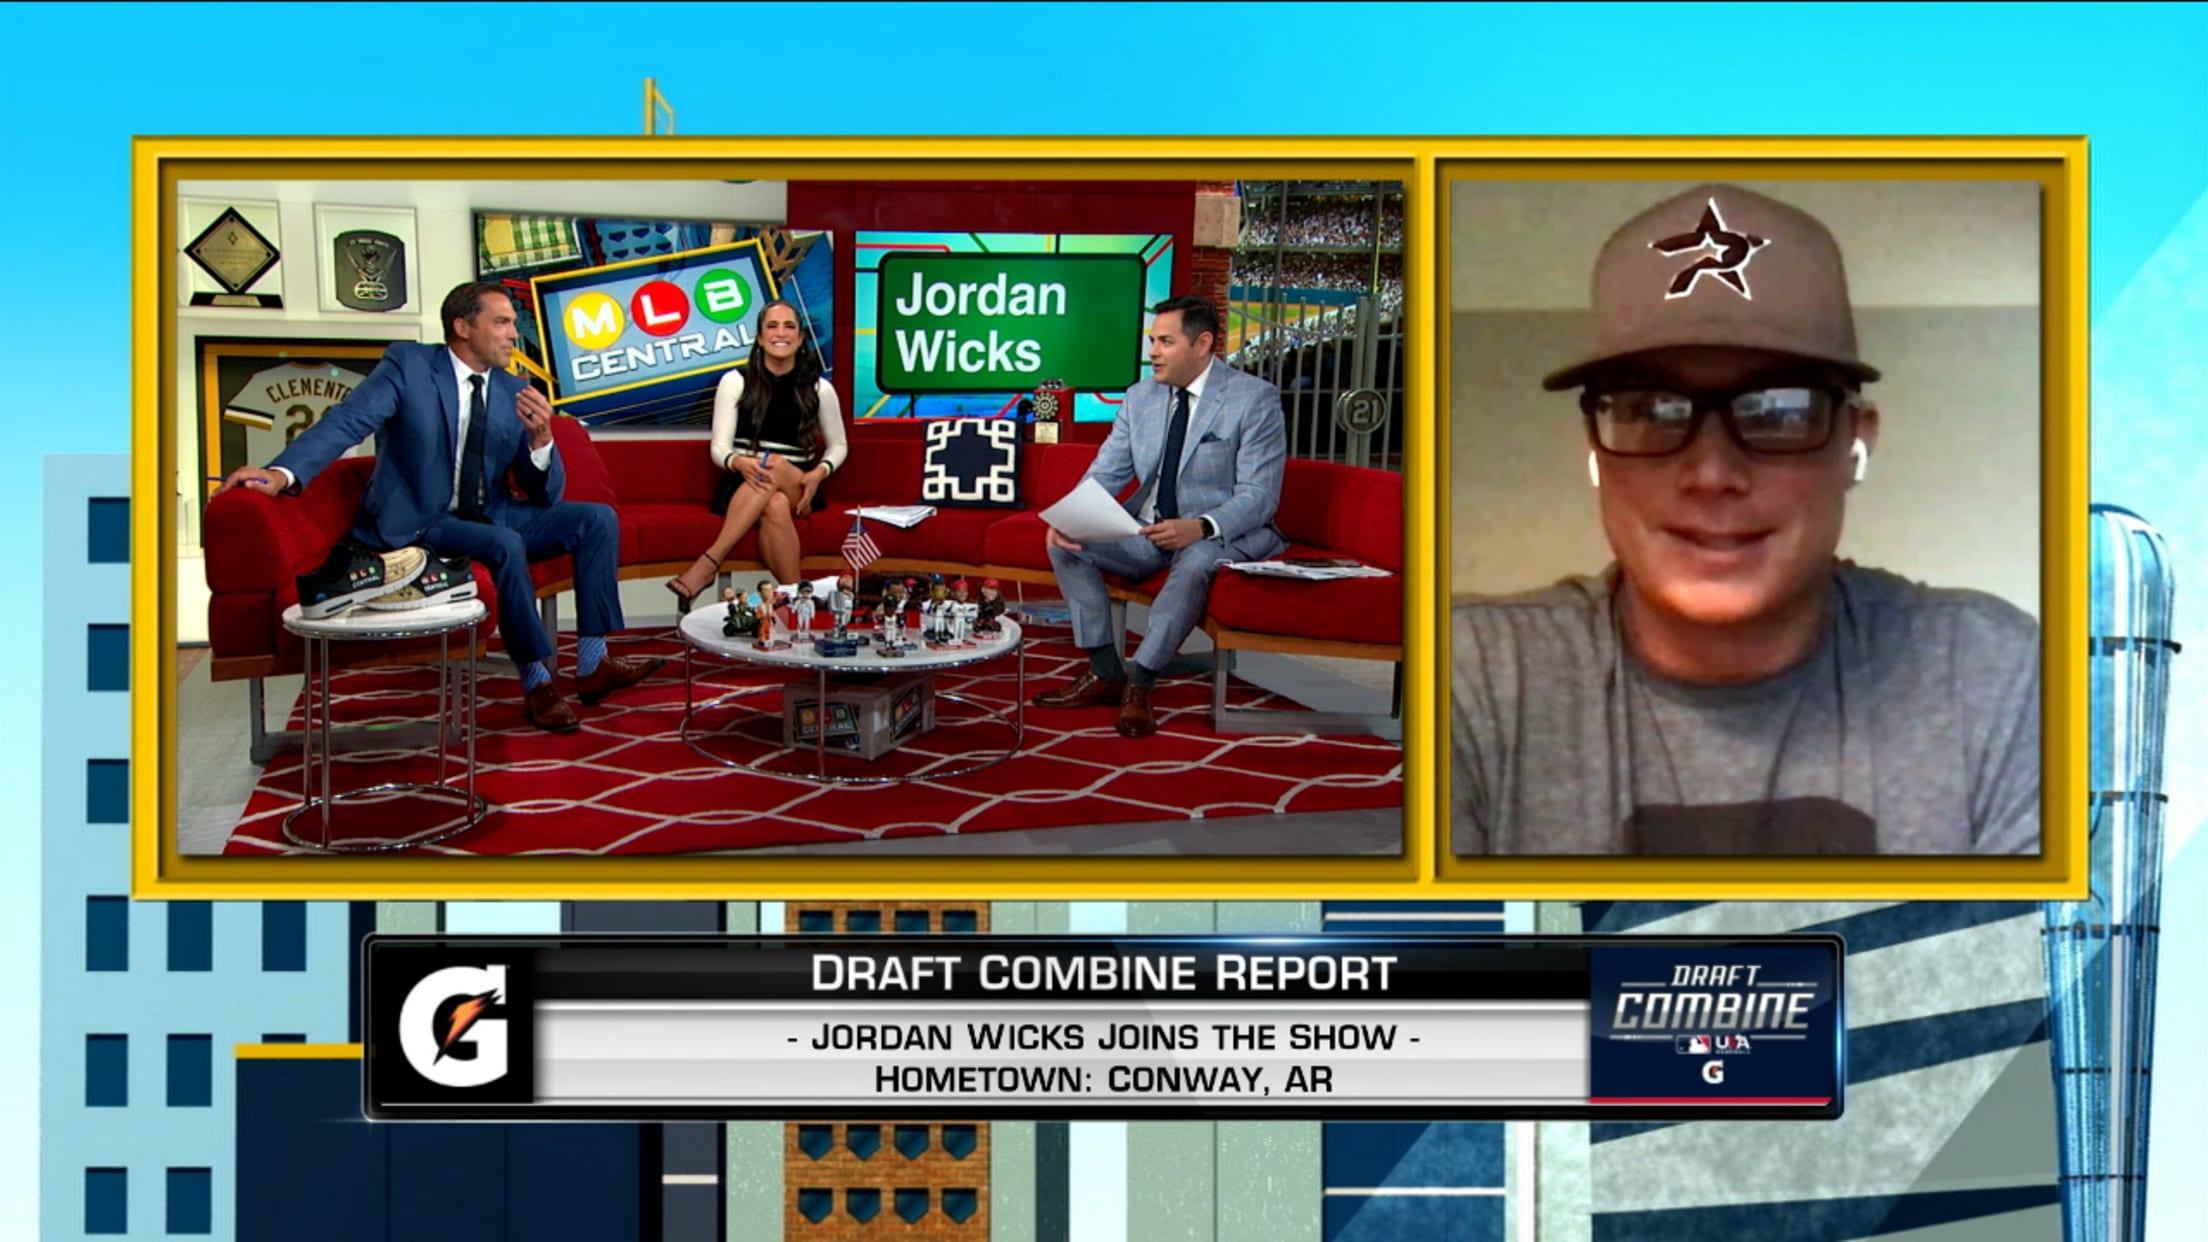 Jordan Wicks on Draft Combine